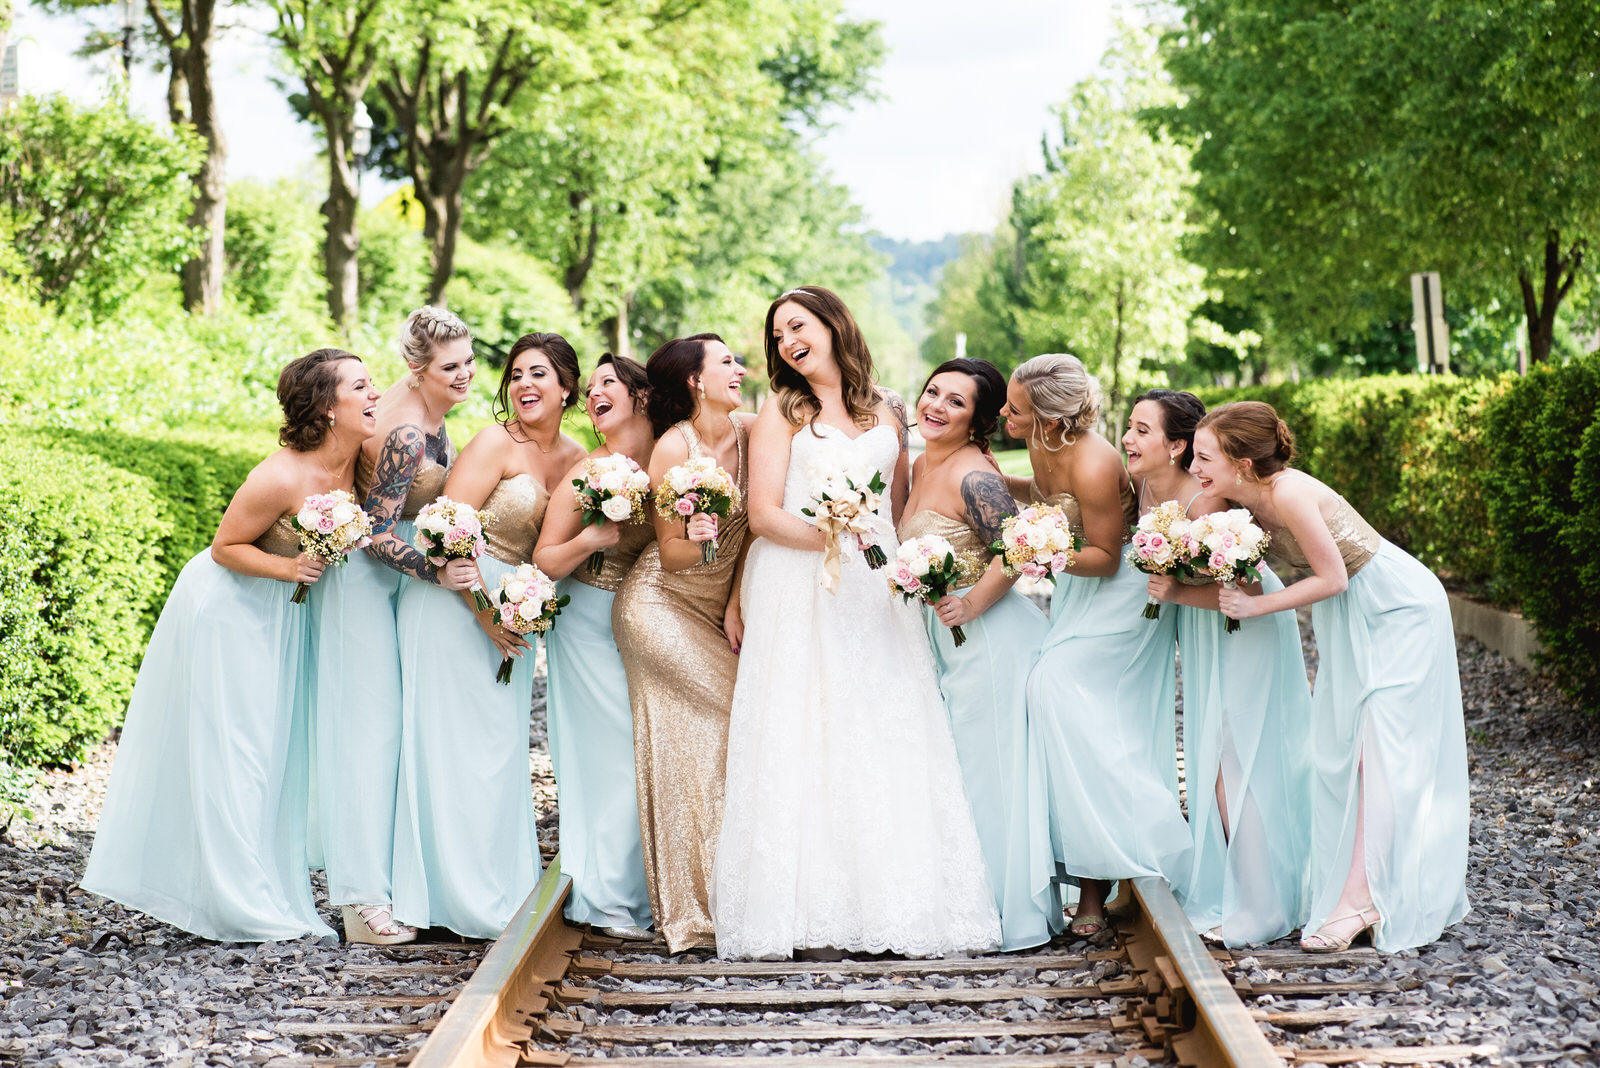 Laube_Banquet_Hall__Wedding_Photos_055.jpg